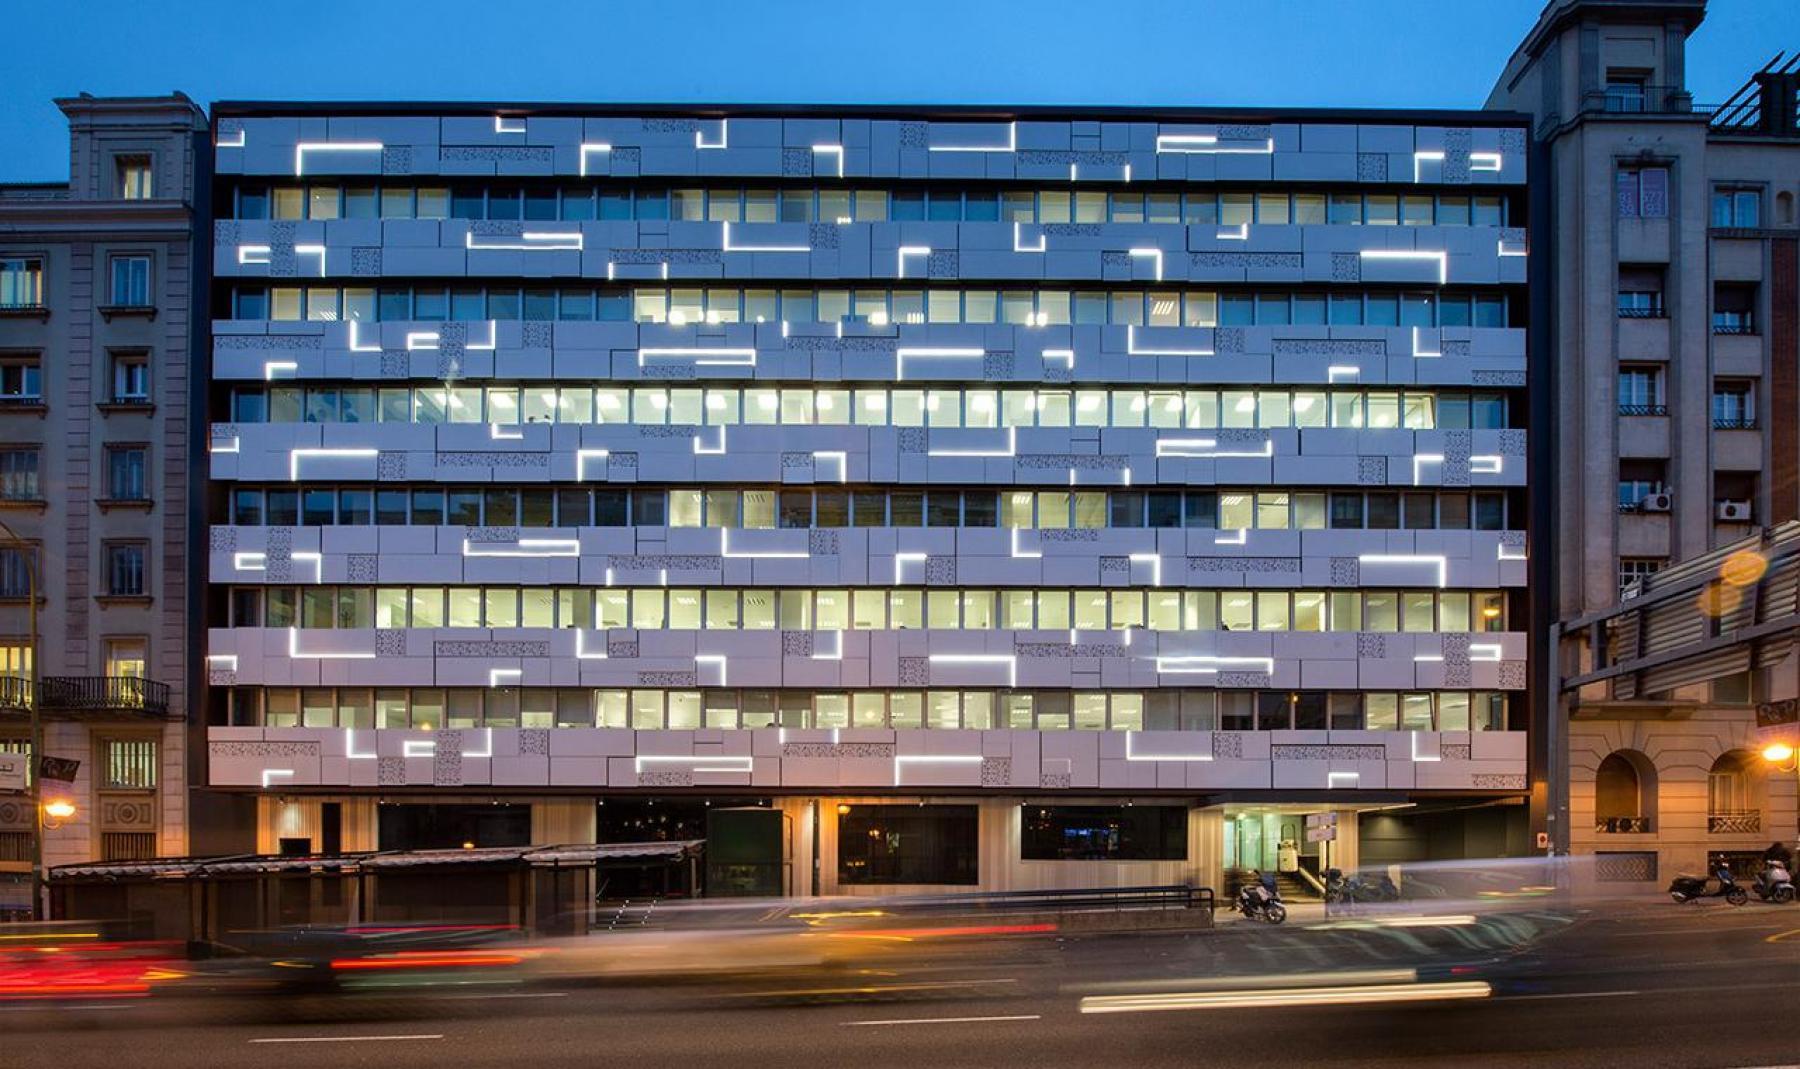 Alquilar oficinas Calle de José Abascal 56, Madrid (4)